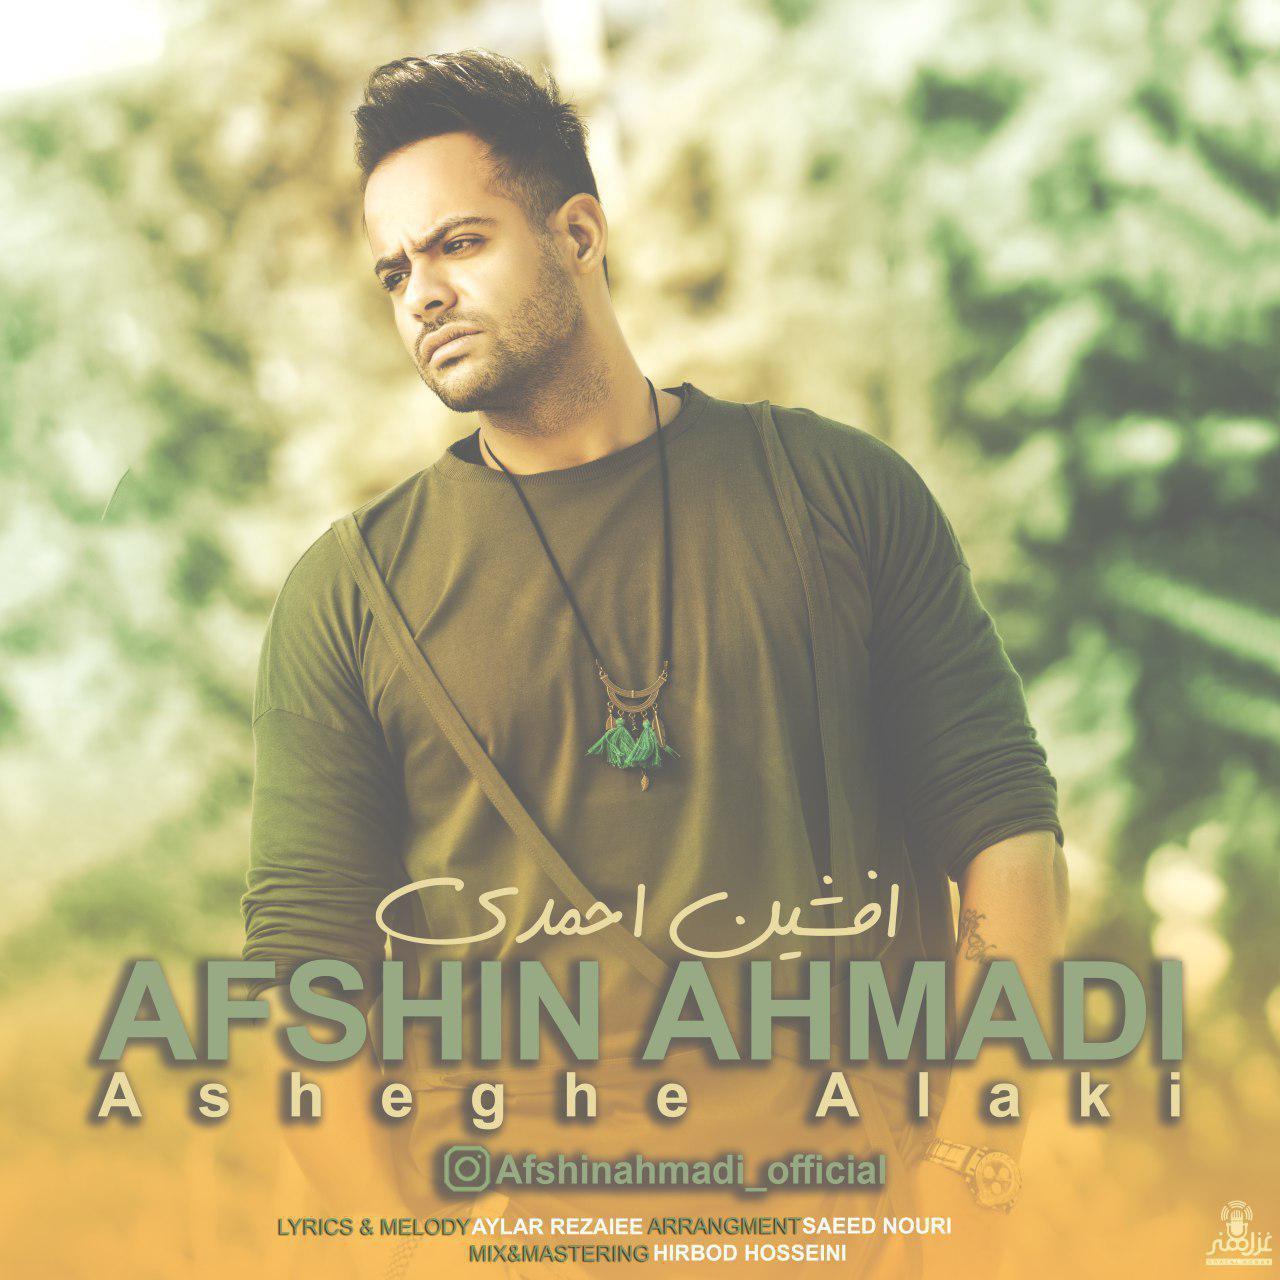 Afshin Ahmadi – Asheghe Alaki